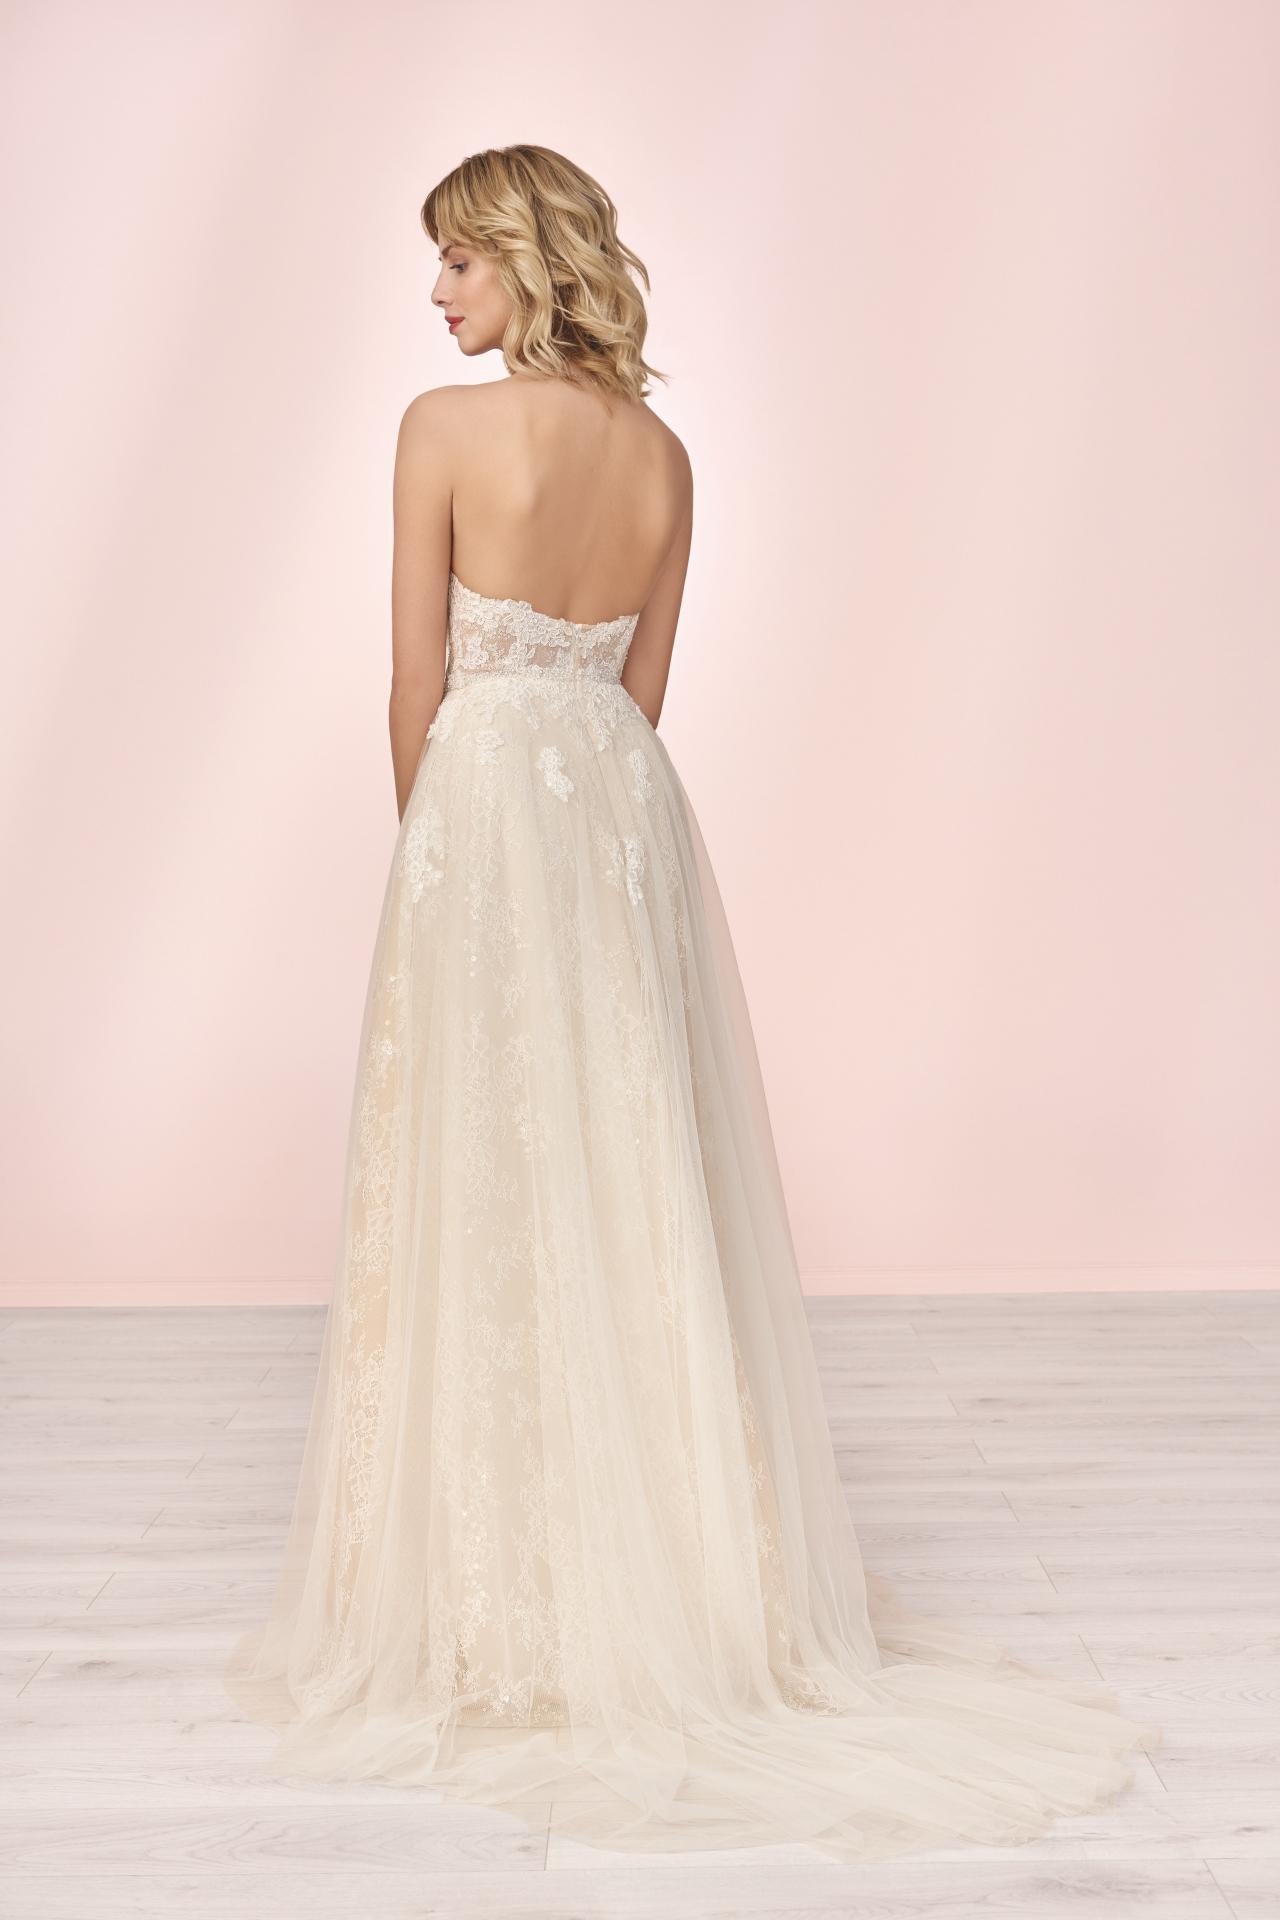 Brautkleid Elizabeth Konin 2019 - 4138T-1